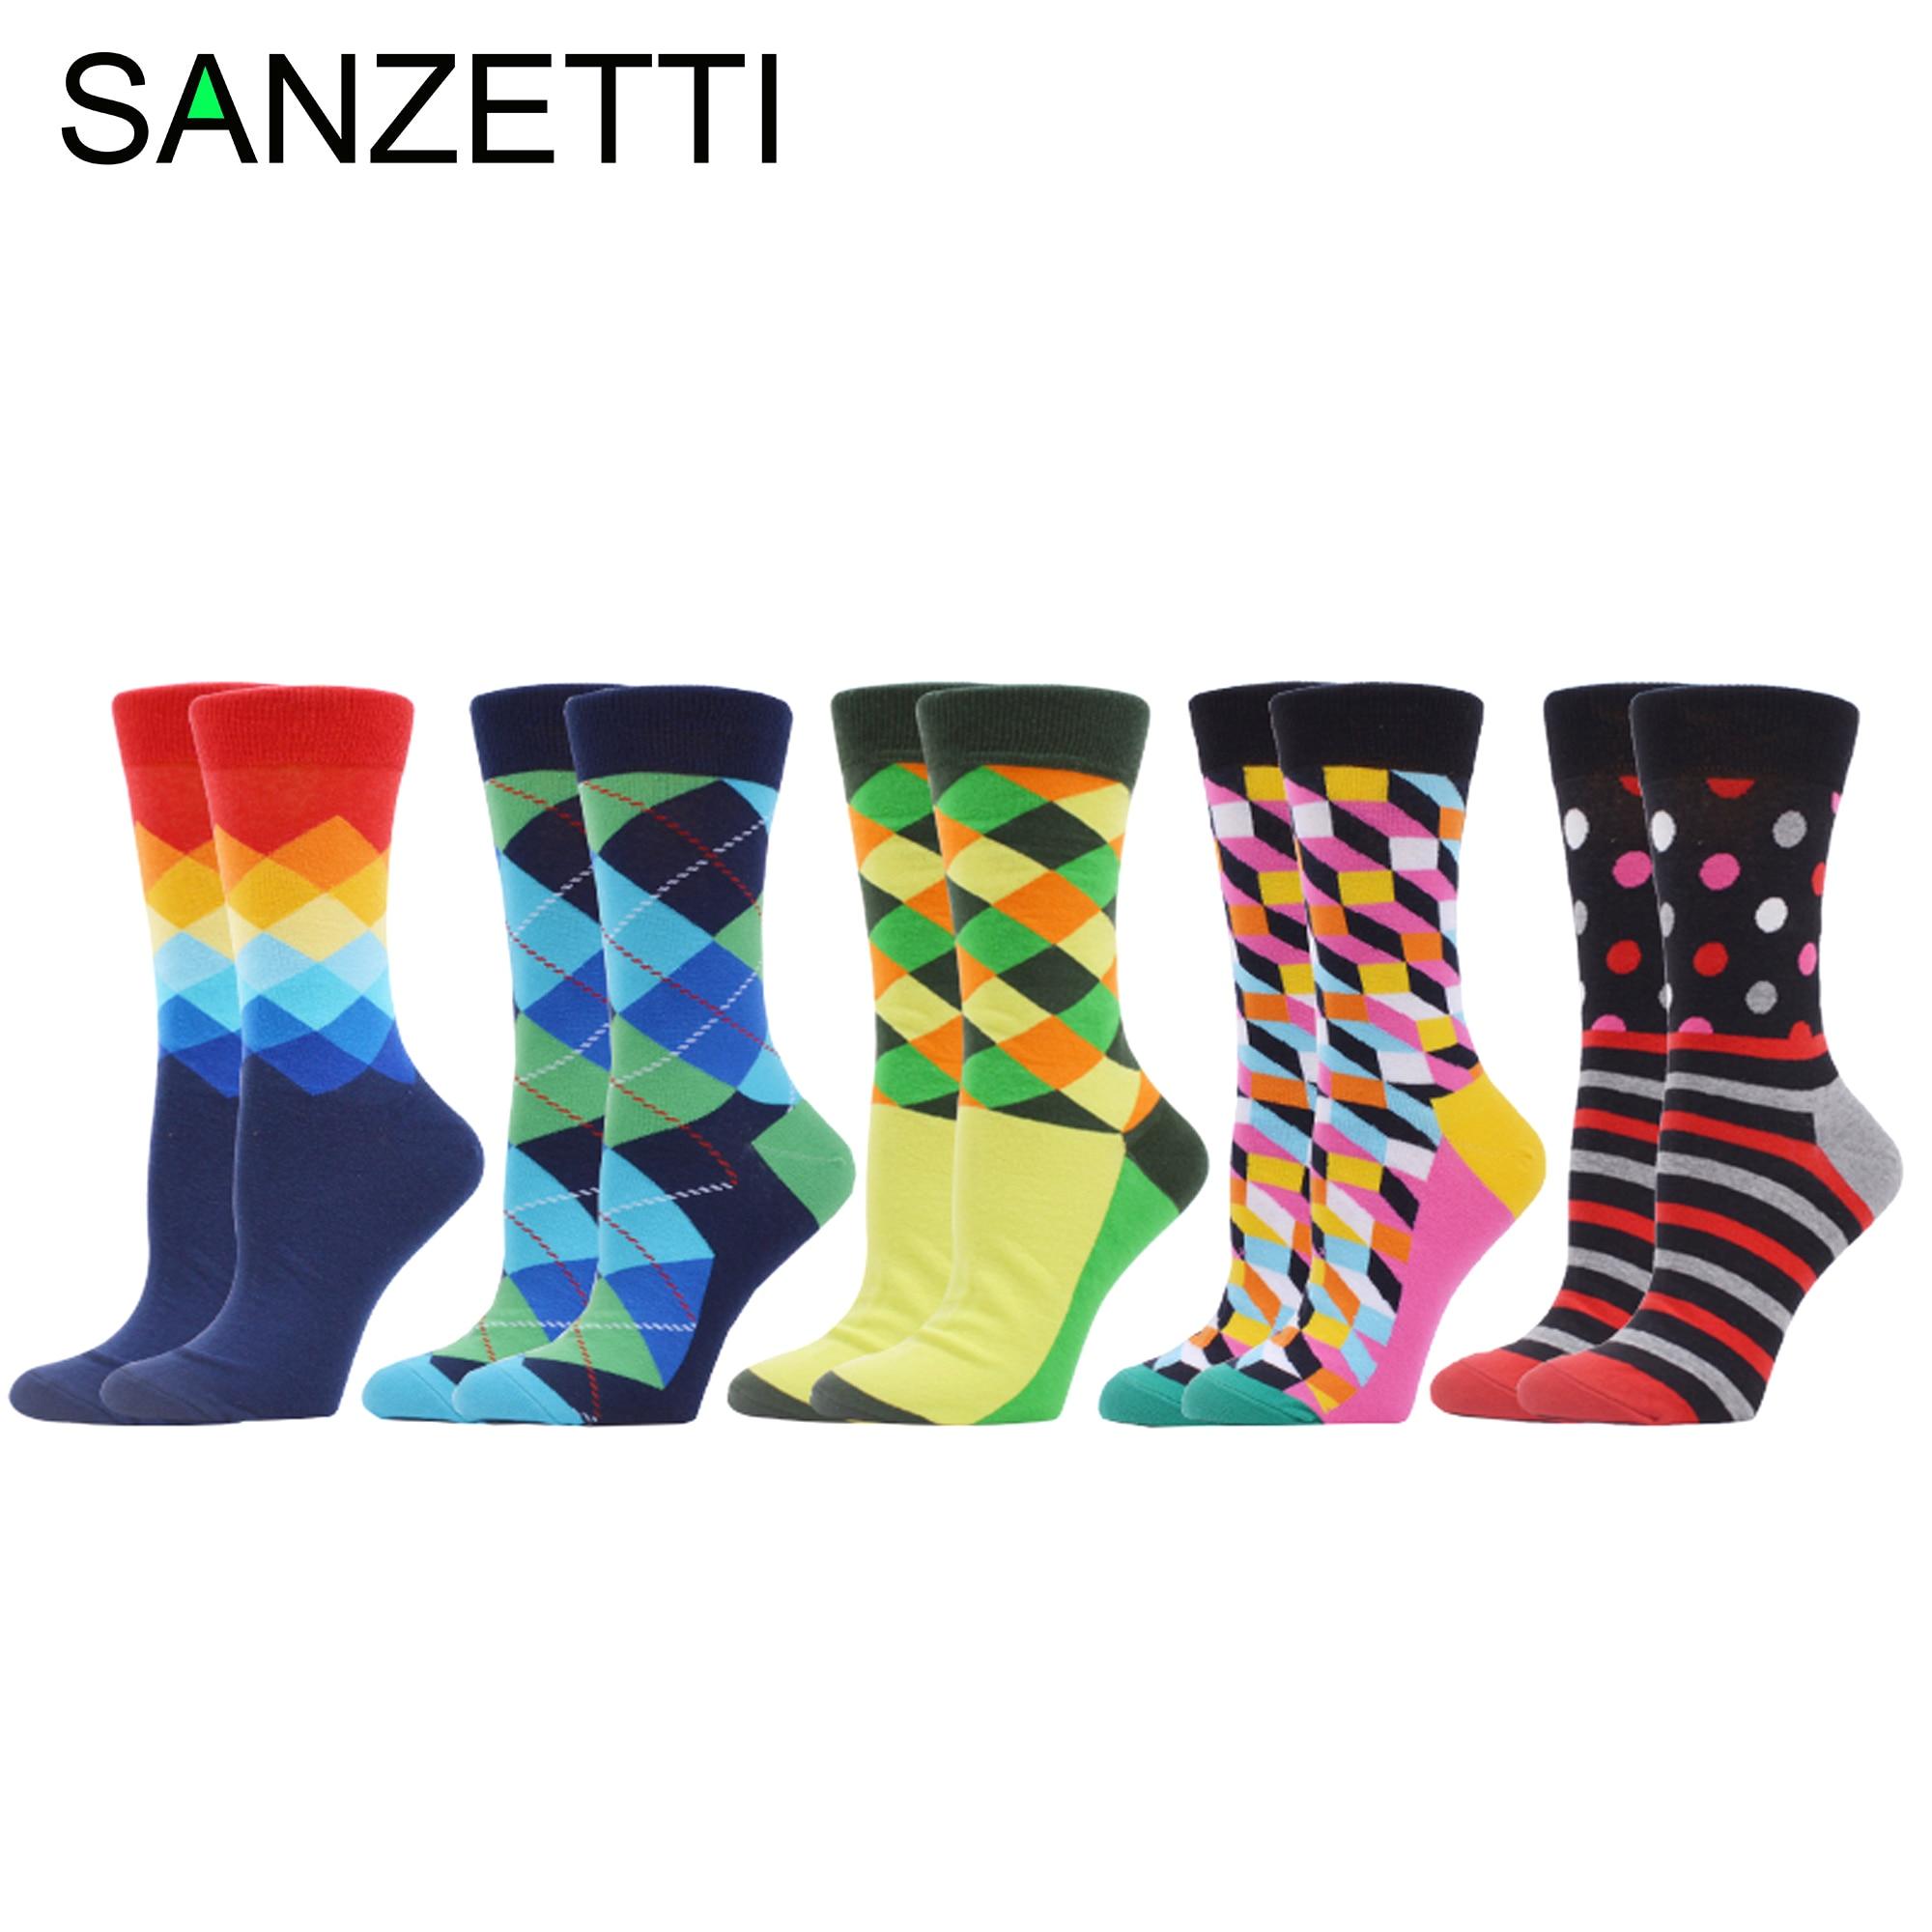 SANZETTI 5 Pairs 2020 Leisure Art Pretty Women's Combed Cotton Socks Happy Colorful Harajuku Geometric Figure Dot Stripes Socks